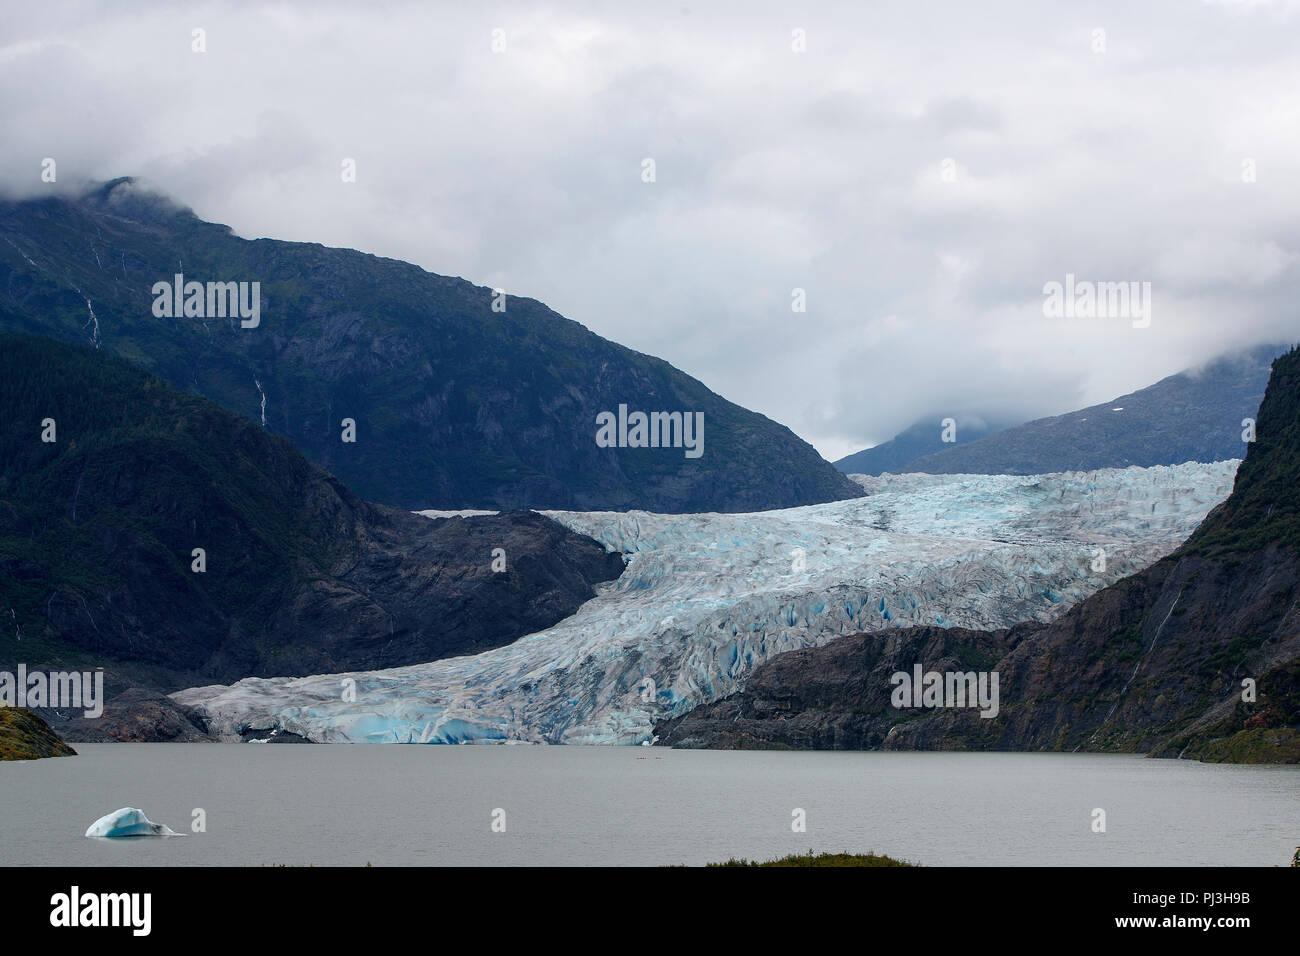 Mendenhall Glacier, Mendenhall Valley, Juneau, Alaska, United States of America - Stock Image